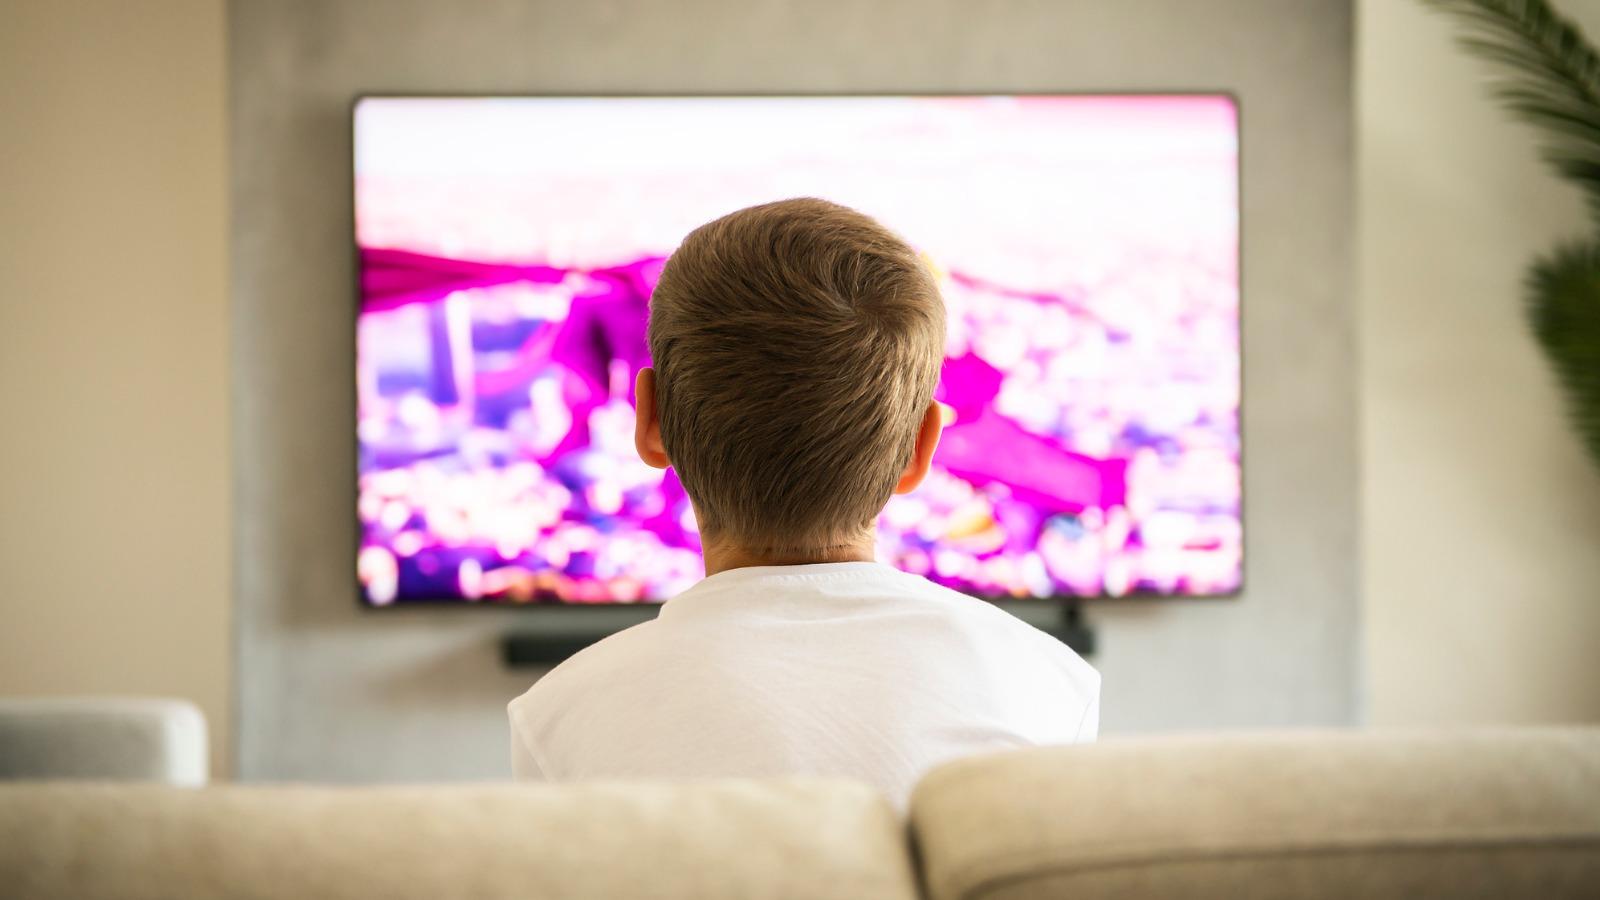 Social Media und Streaming: Medienkonsum fördert Essstörung bei Kindern